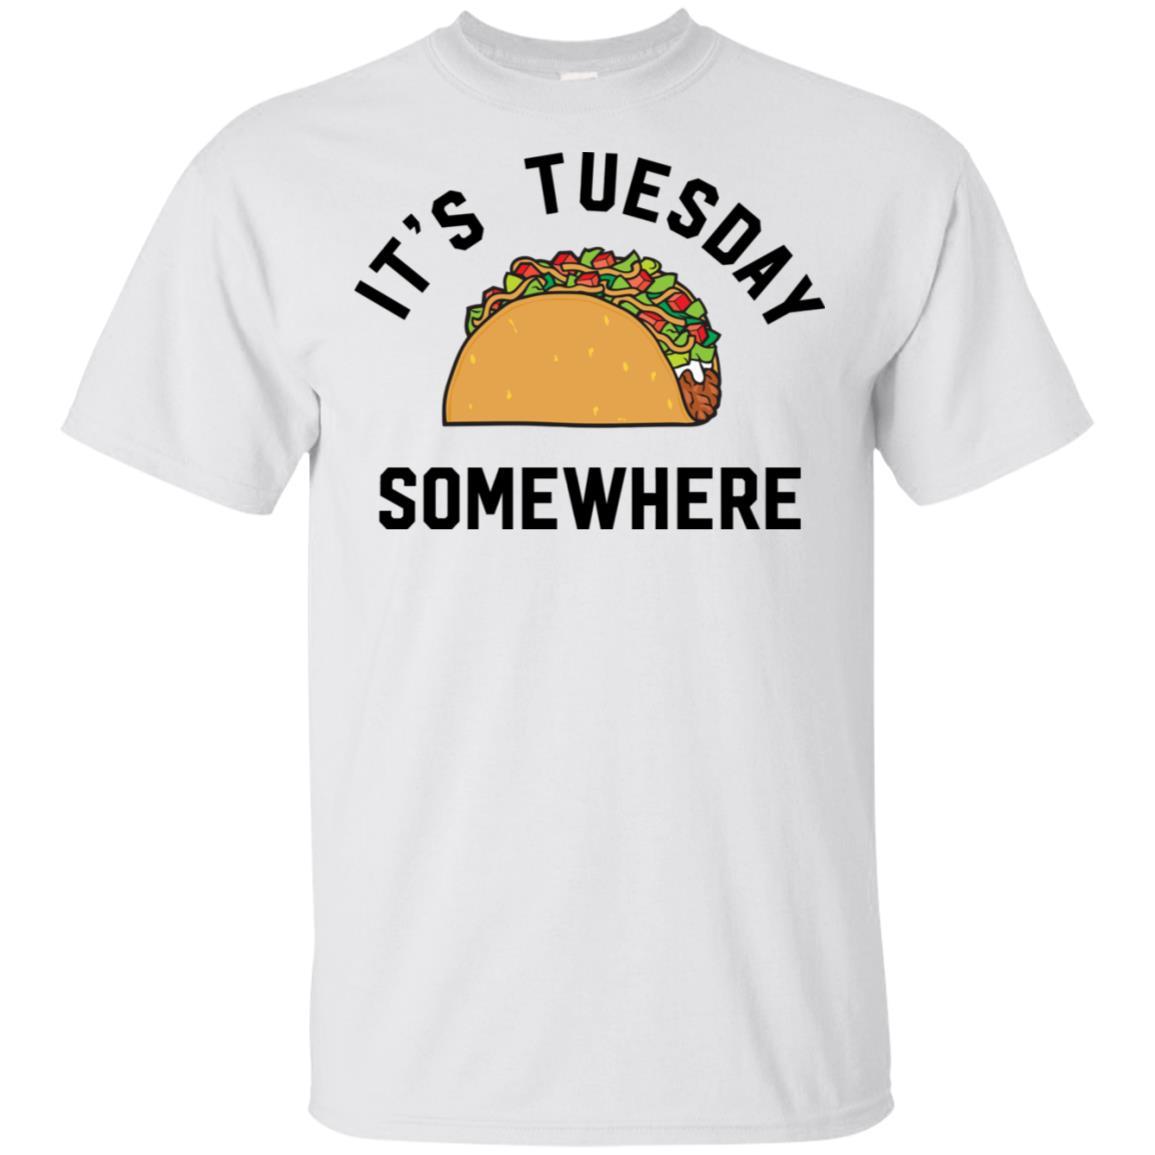 new product 5cb3e 480ad LeBron James It's Tuesday somewhere taco shirt